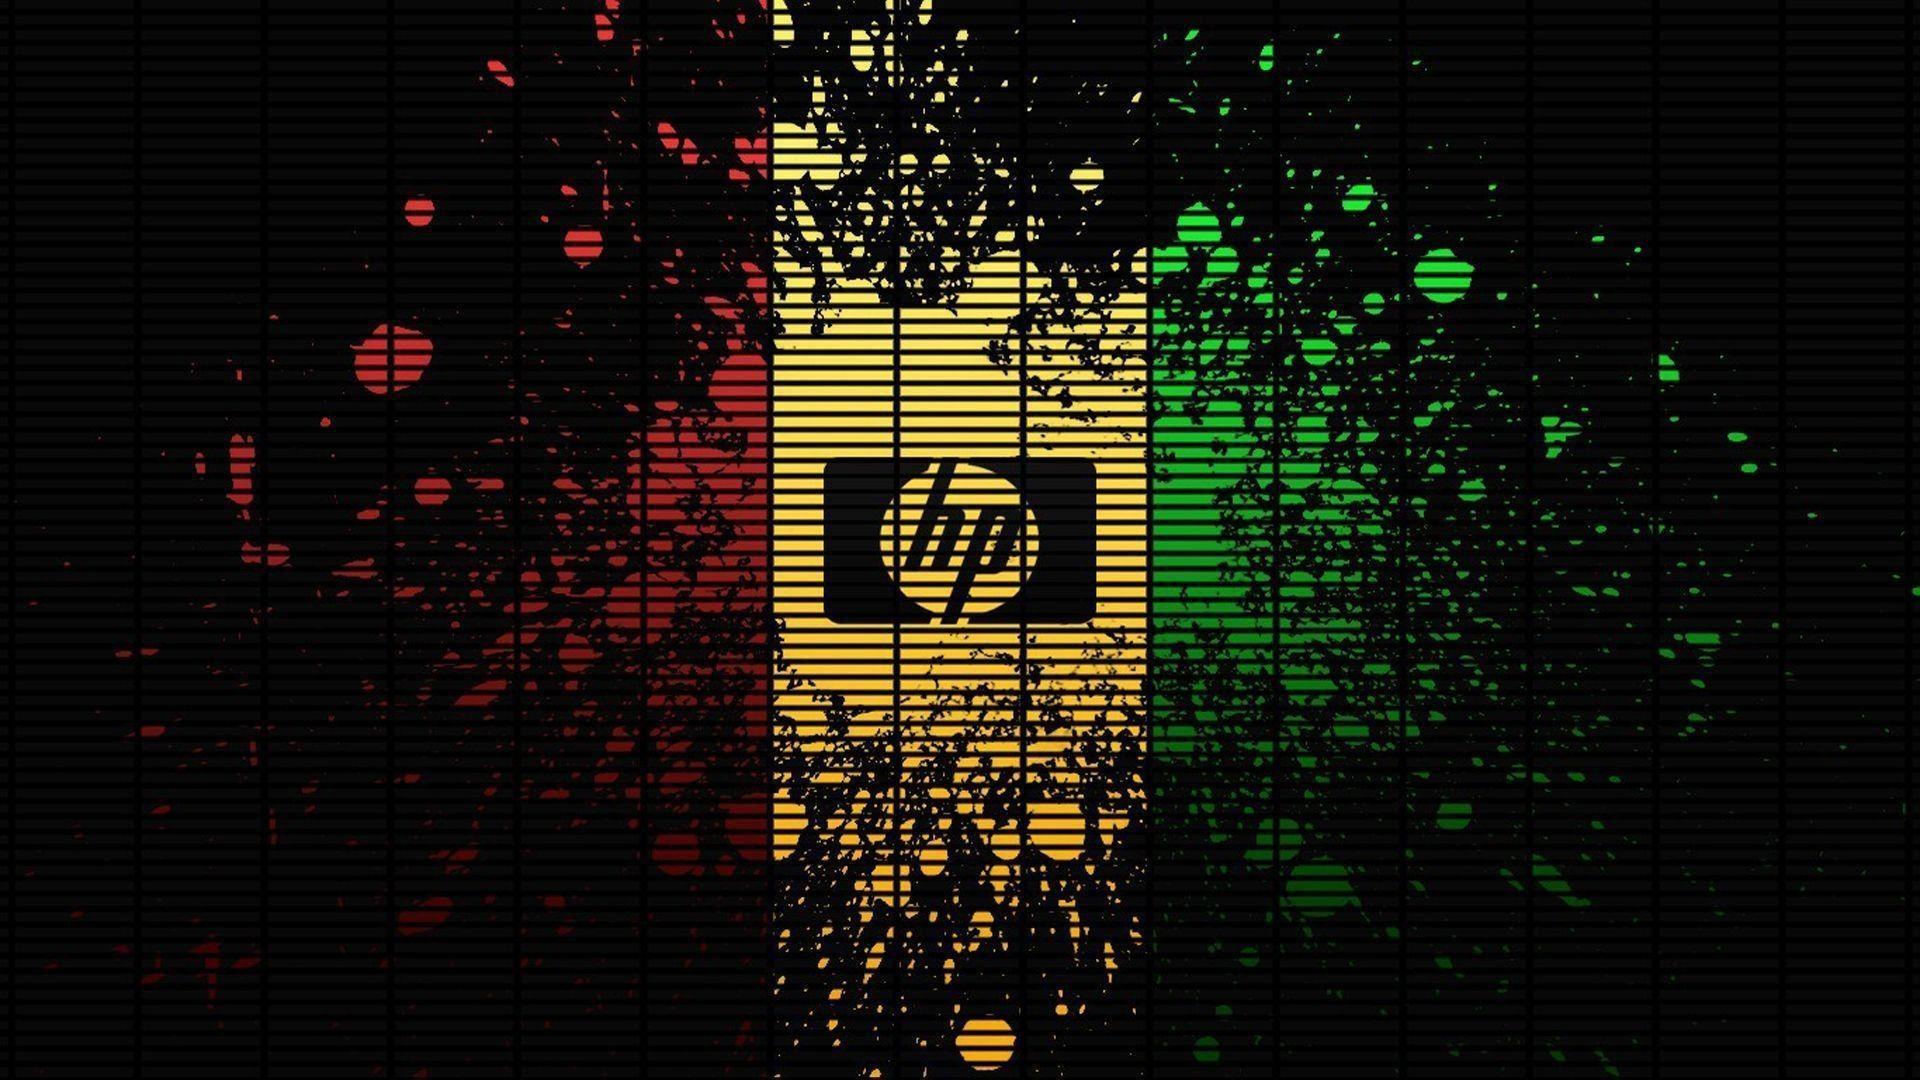 Hp 4k Ultra Hd Wallpapers Top Free Hp 4k Ultra Hd Backgrounds